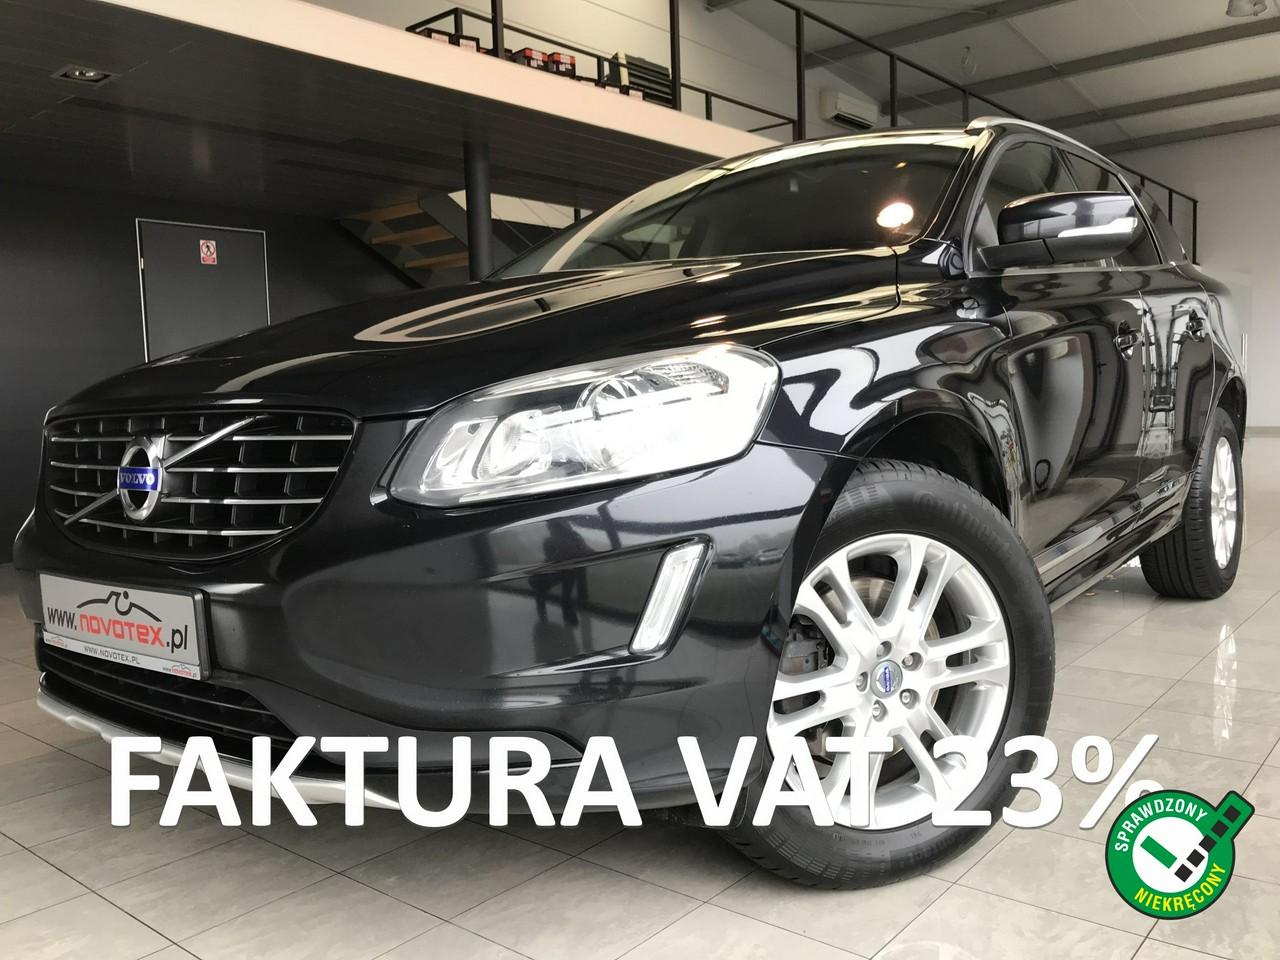 Volvo XC 60 D4*Momentum*xenon*navi*BLIS*nowe opony*serwis w ASO*Gwarancja VIP